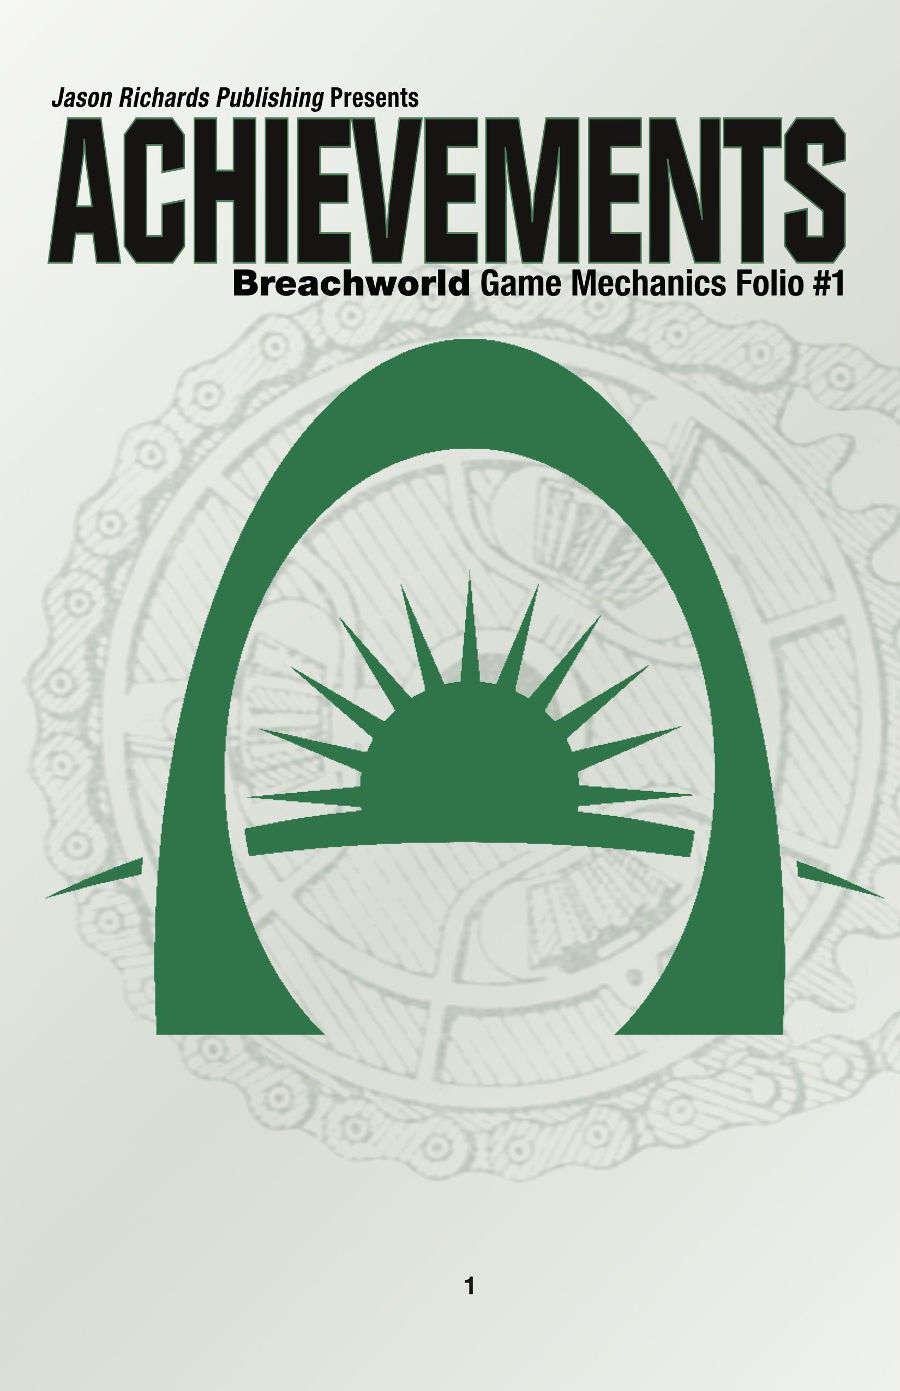 Breachworld Game Mechanics Folio #1 - Achievements